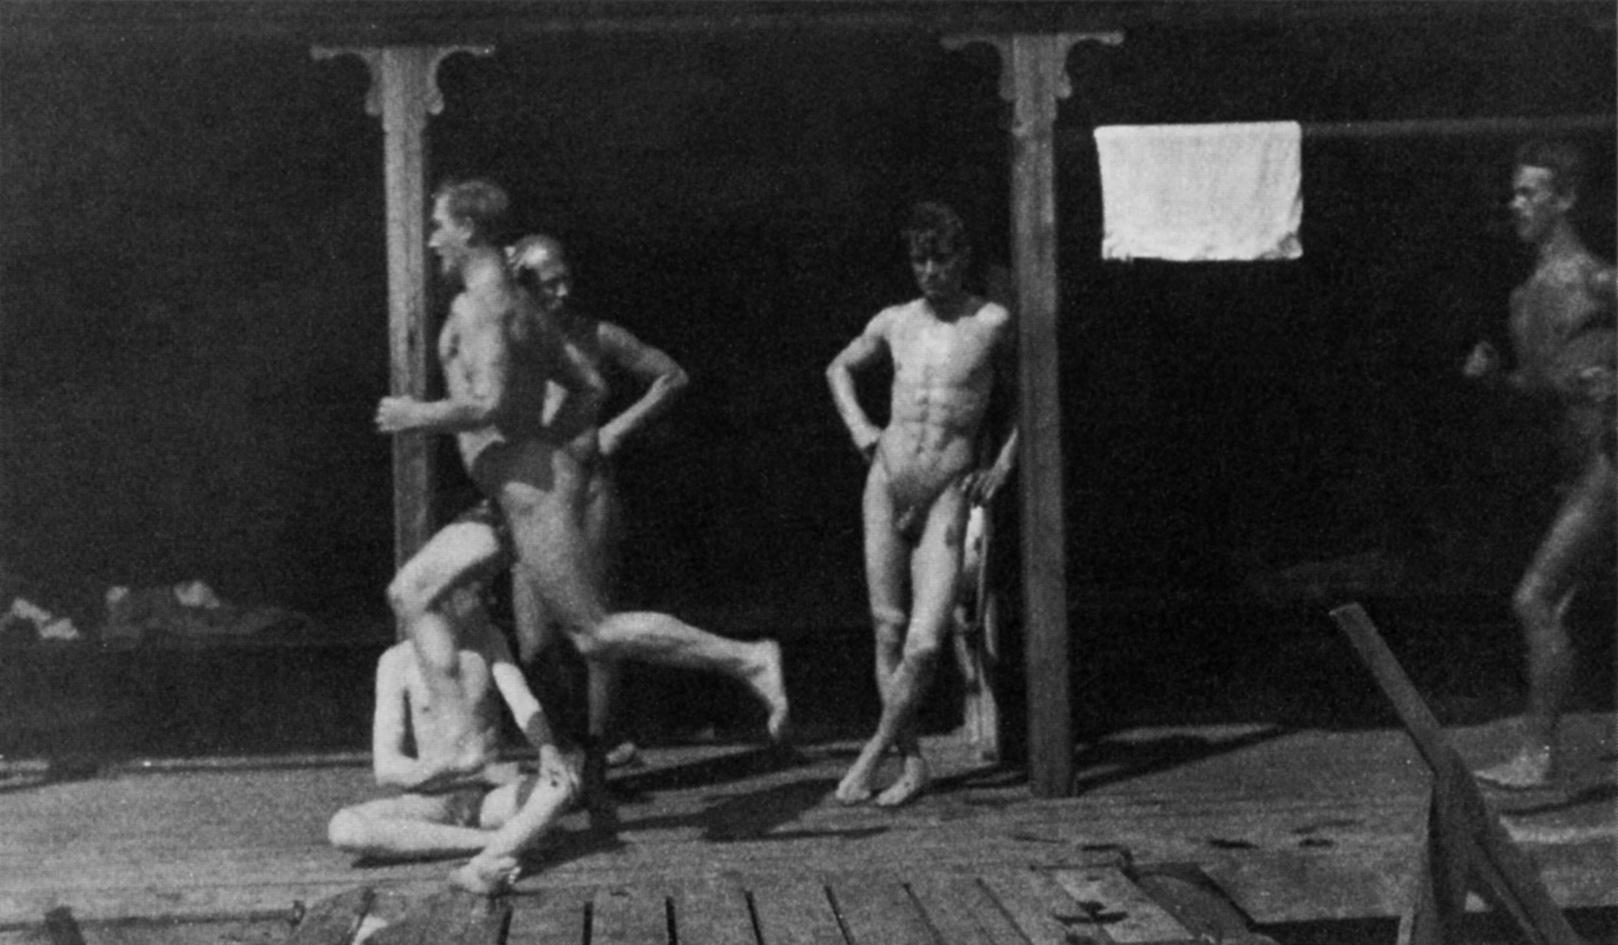 Ragazzi che gareggiano ai Flottans Badhus